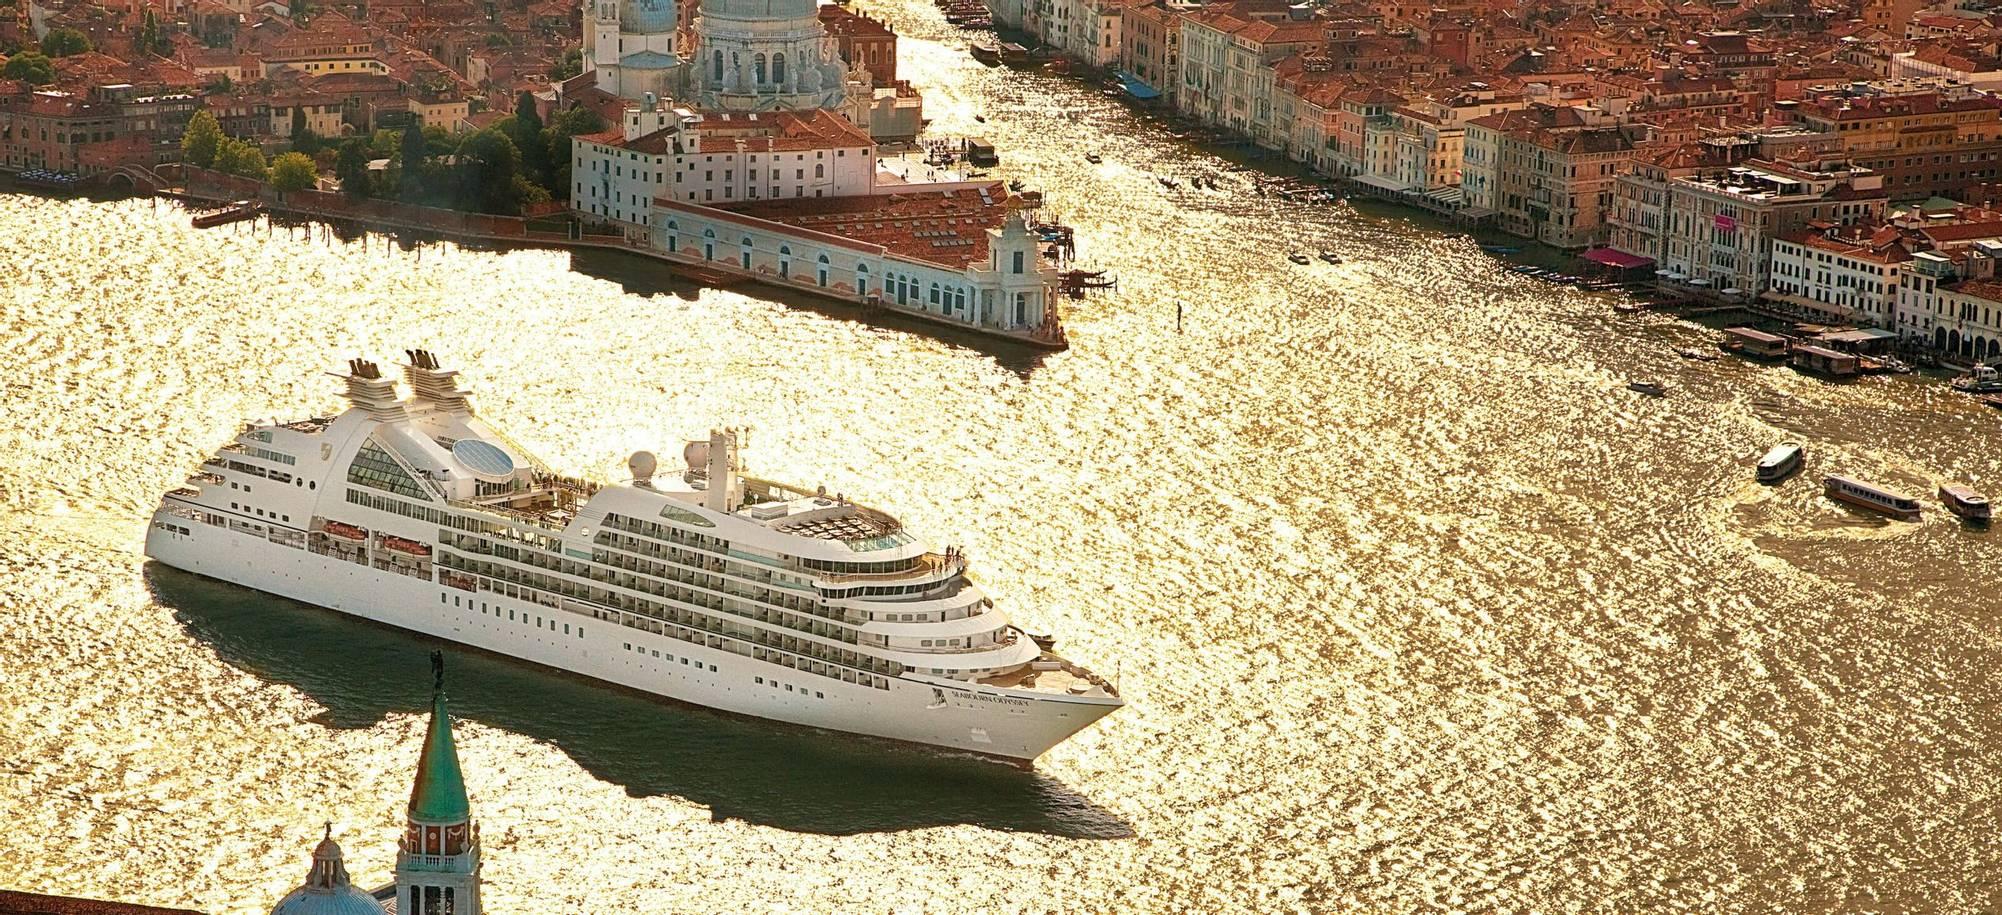 Seabourne_VSOE_ship.jpg